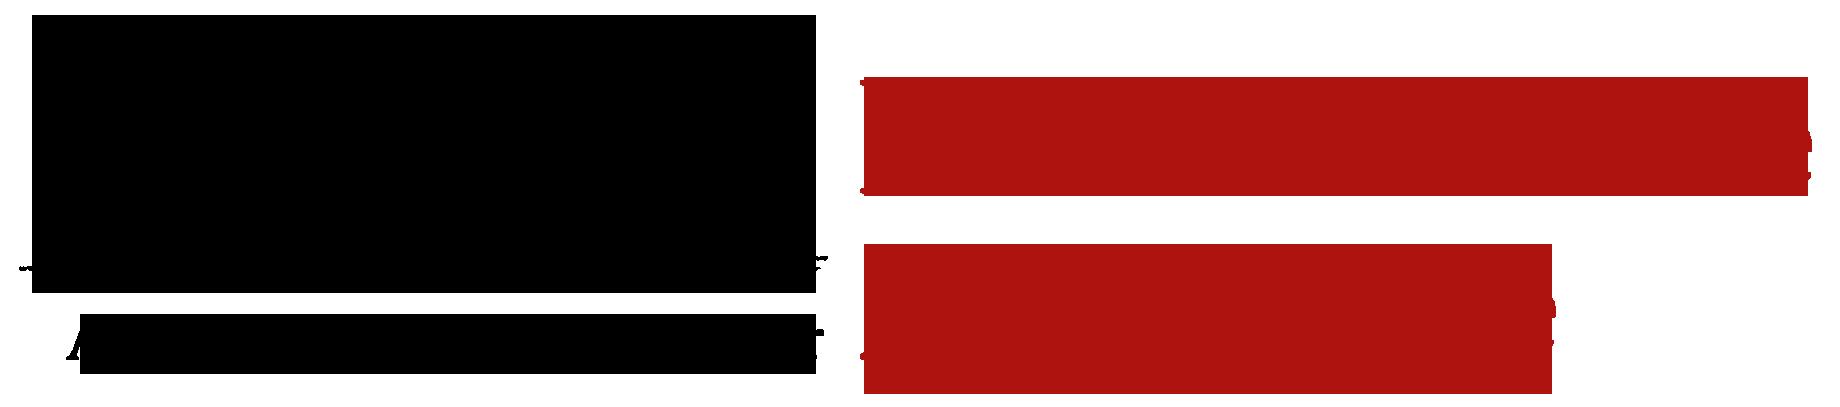 Kiefernheide-Apotheke, Neustrelitz